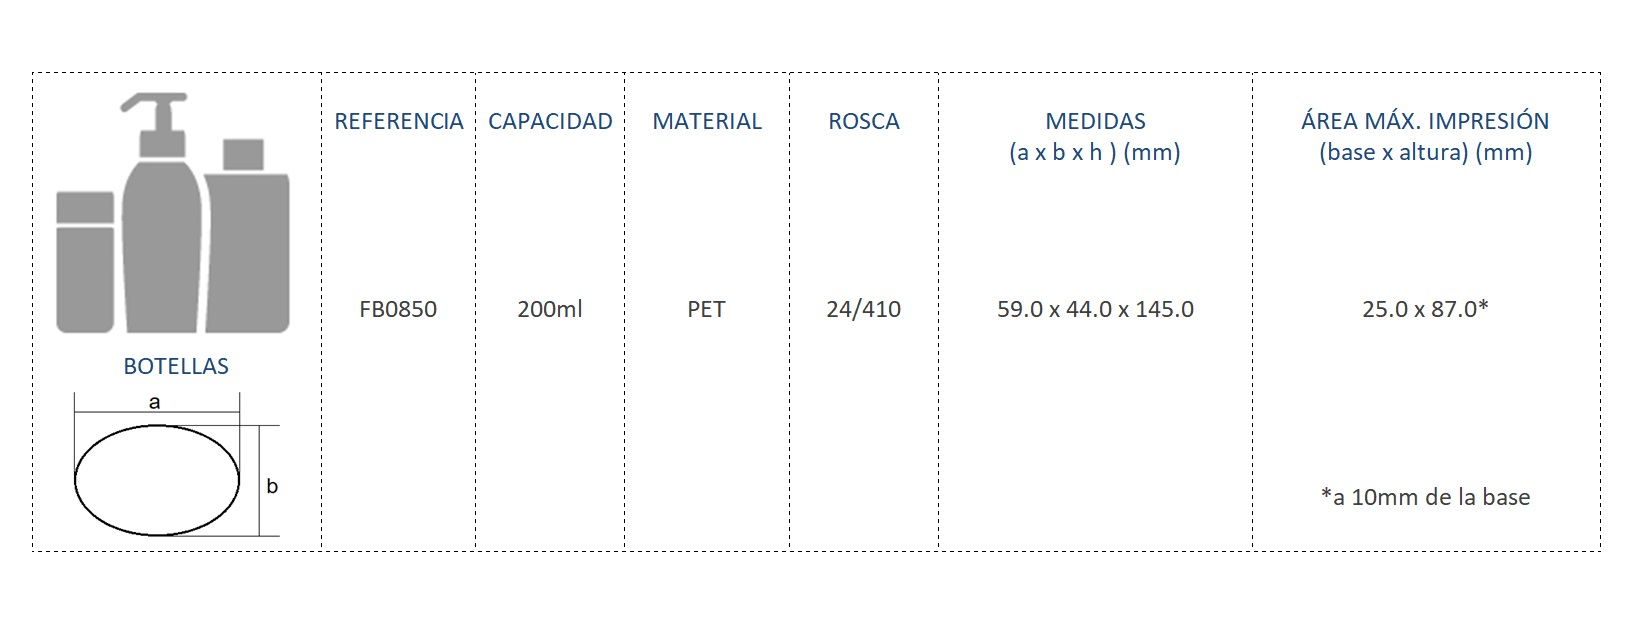 Cuadro de materiales botella FB0850